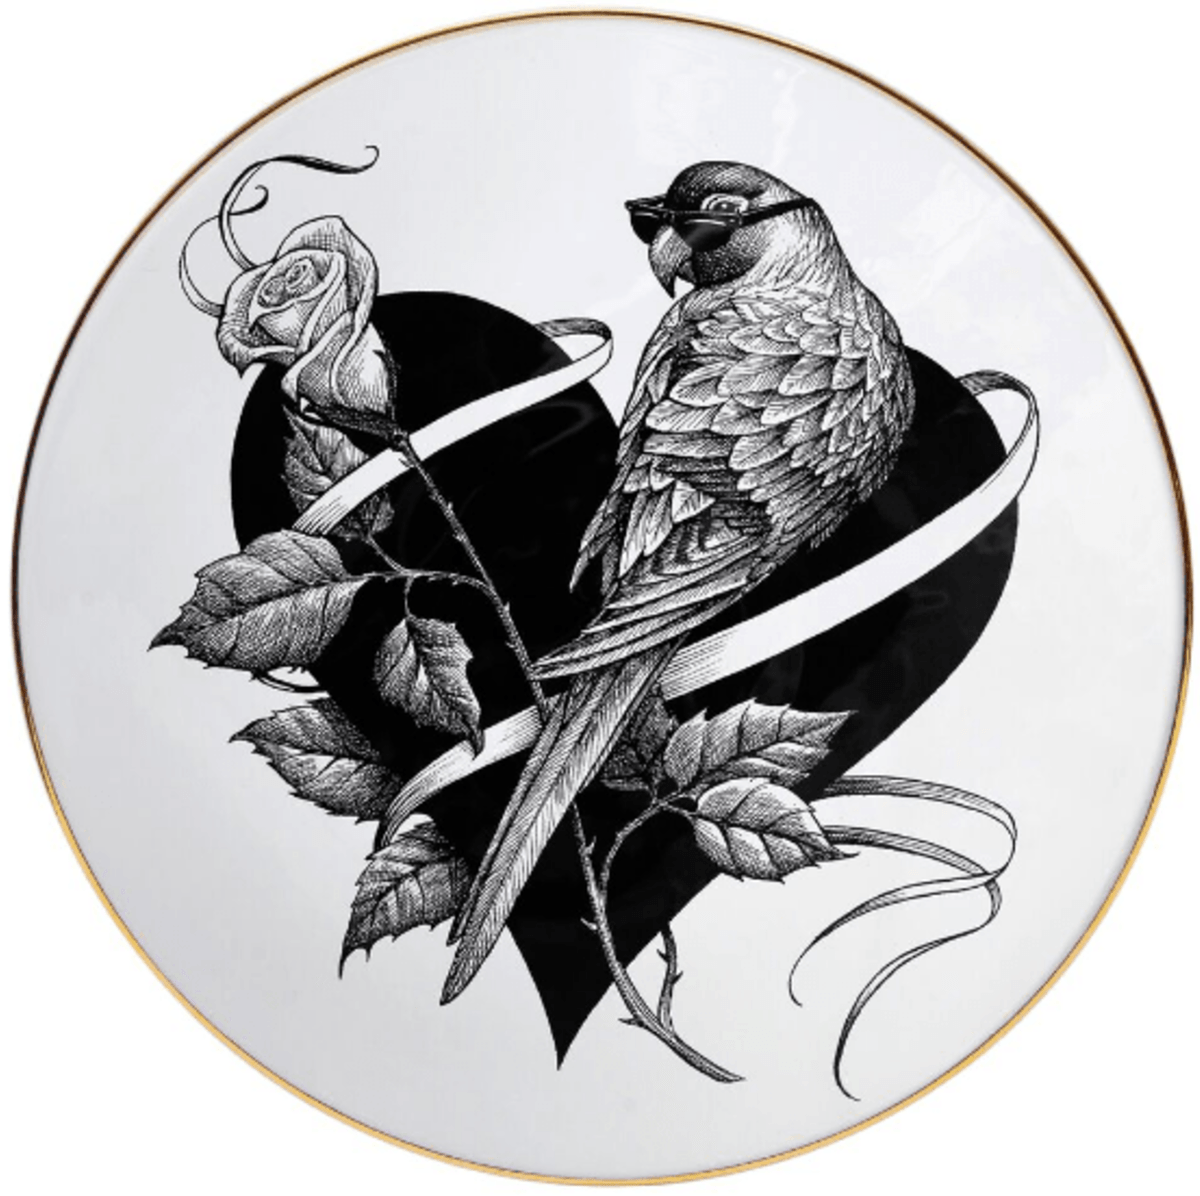 Lovebird Plate Coaster